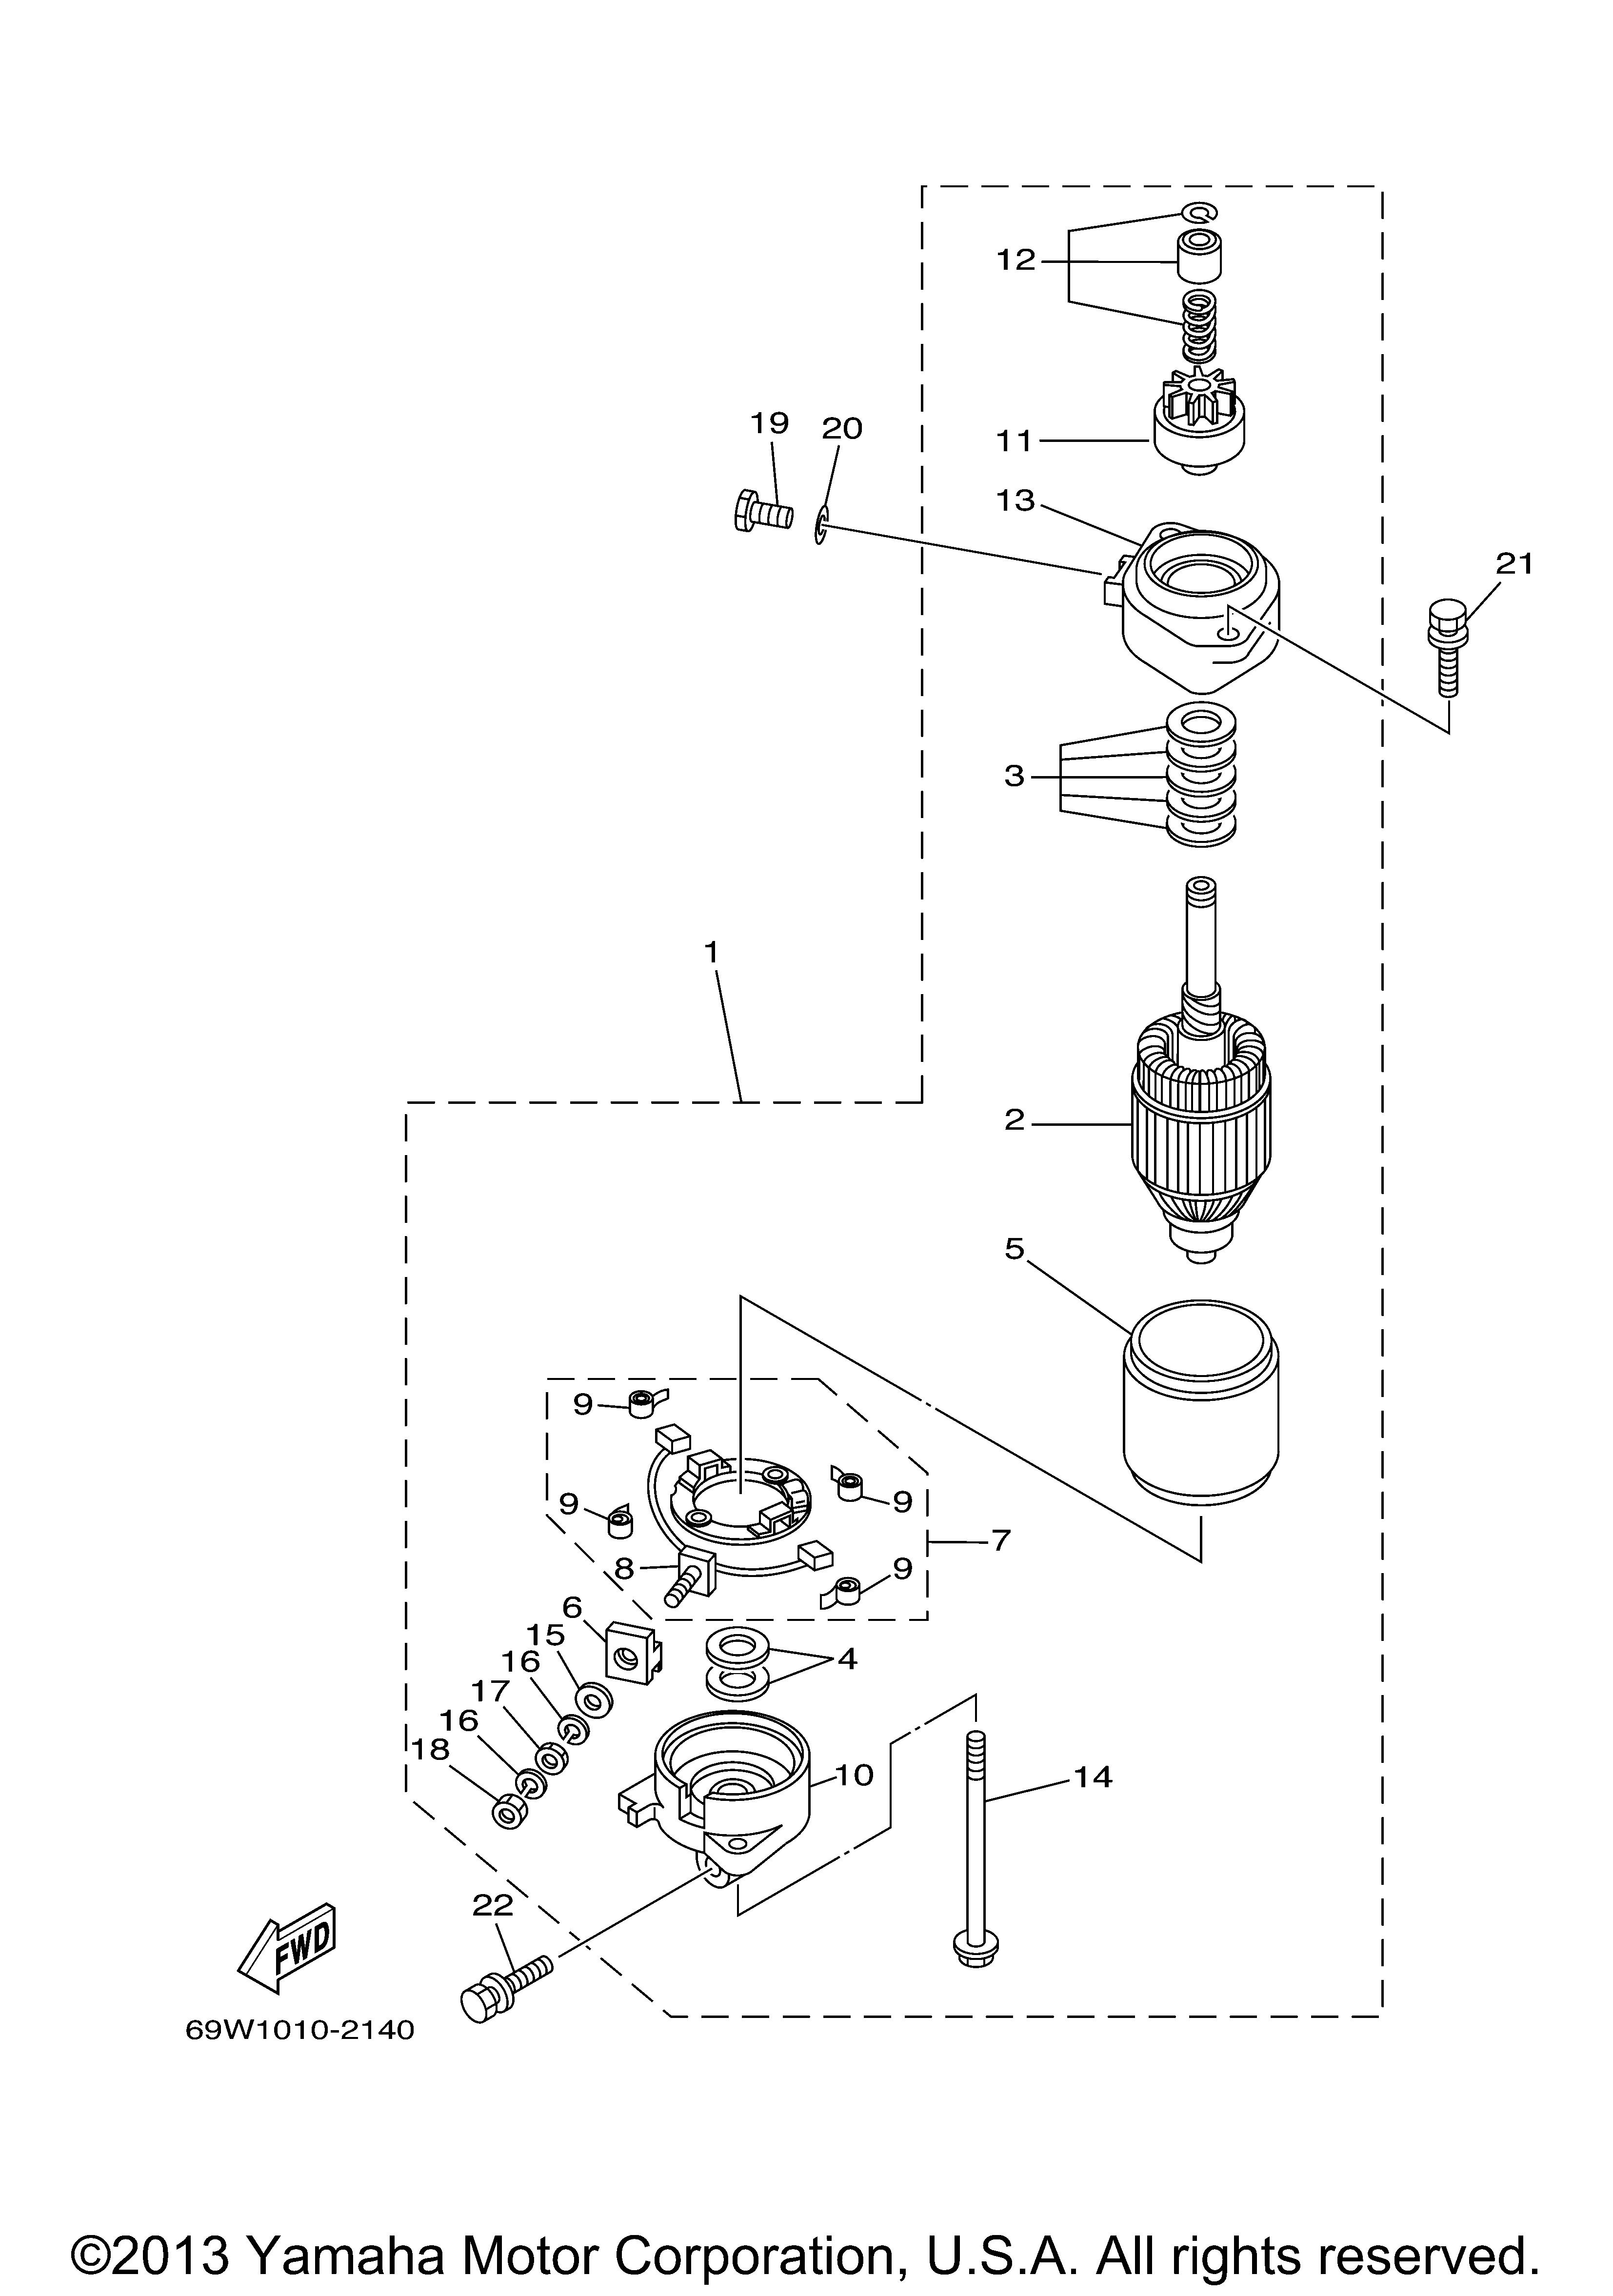 Yamaha | OUTBOARD | F60TLRA | STARTING MOTOR - Yamaha Outboard Motor